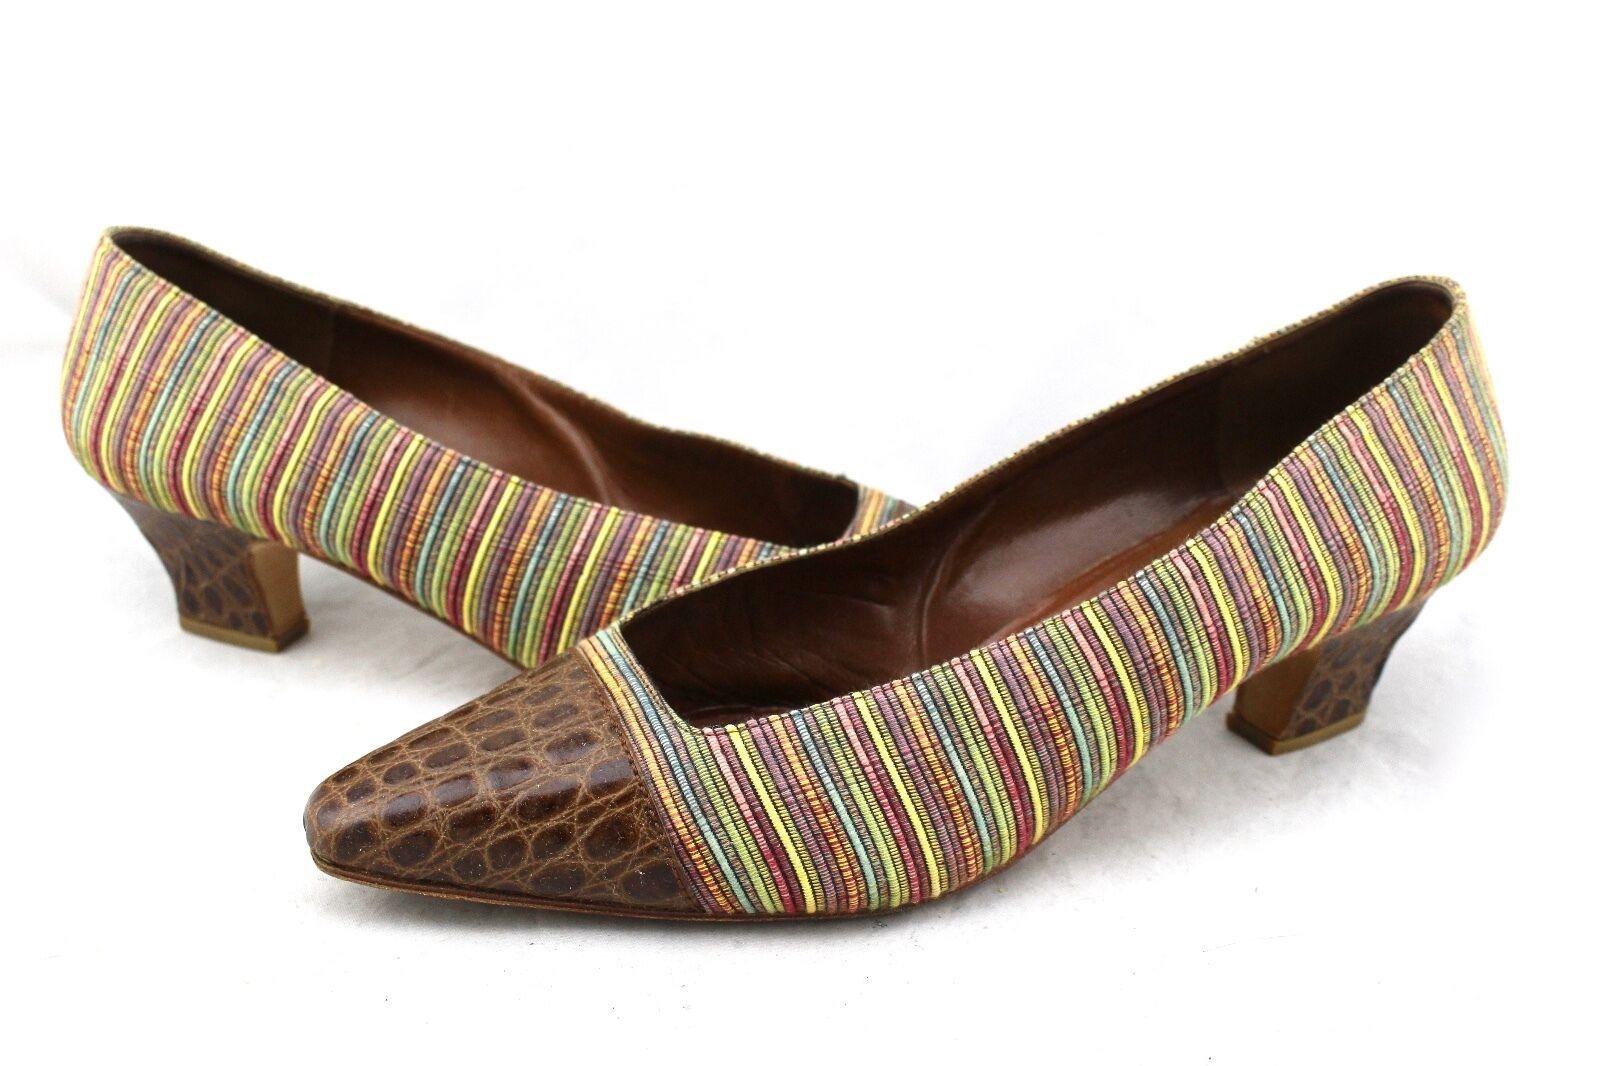 215 PUPI D'ANGIERI Vintage braun Croc Leather Multi-Farbe Stripe Fabric Pumps